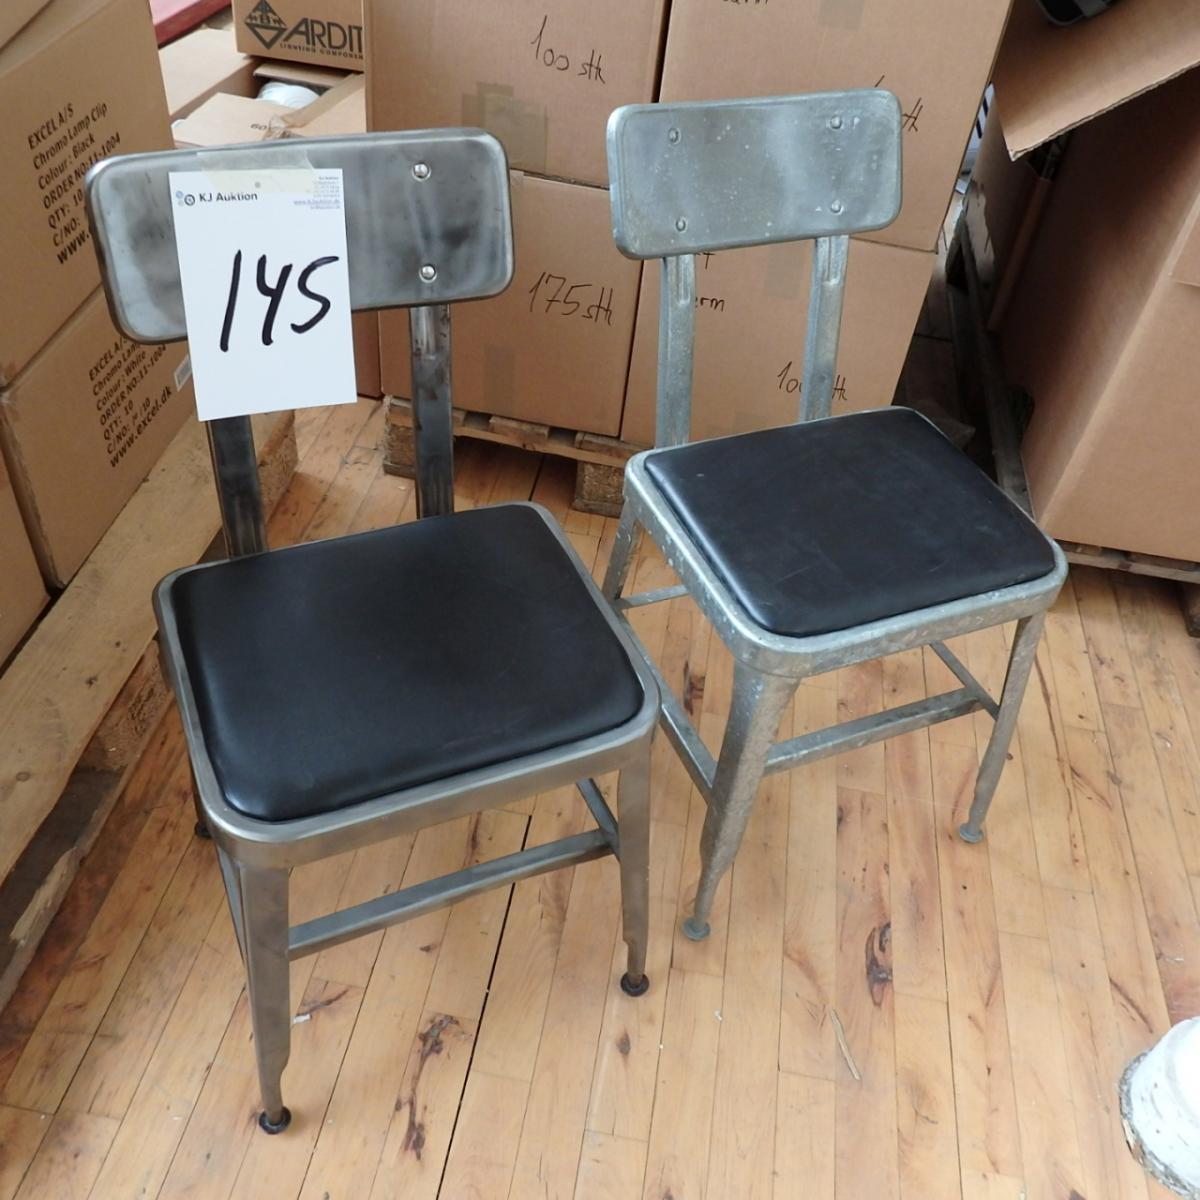 retro stole 2 retro stole fin stand   KJ Auktion   Maskinauktioner retro stole